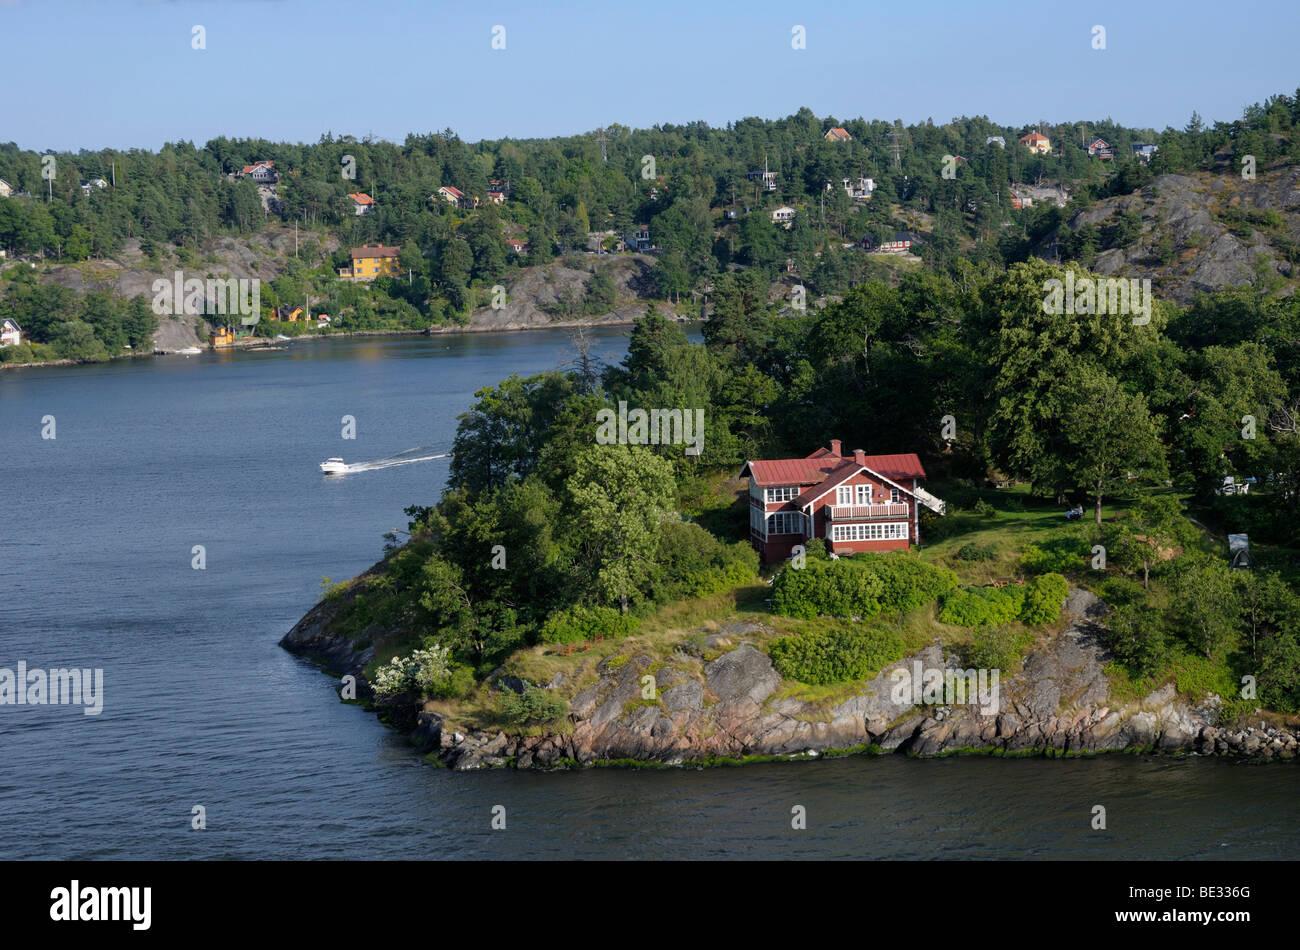 Archipelago with islands, Stockholm, Sweden, Europe Stock Photo